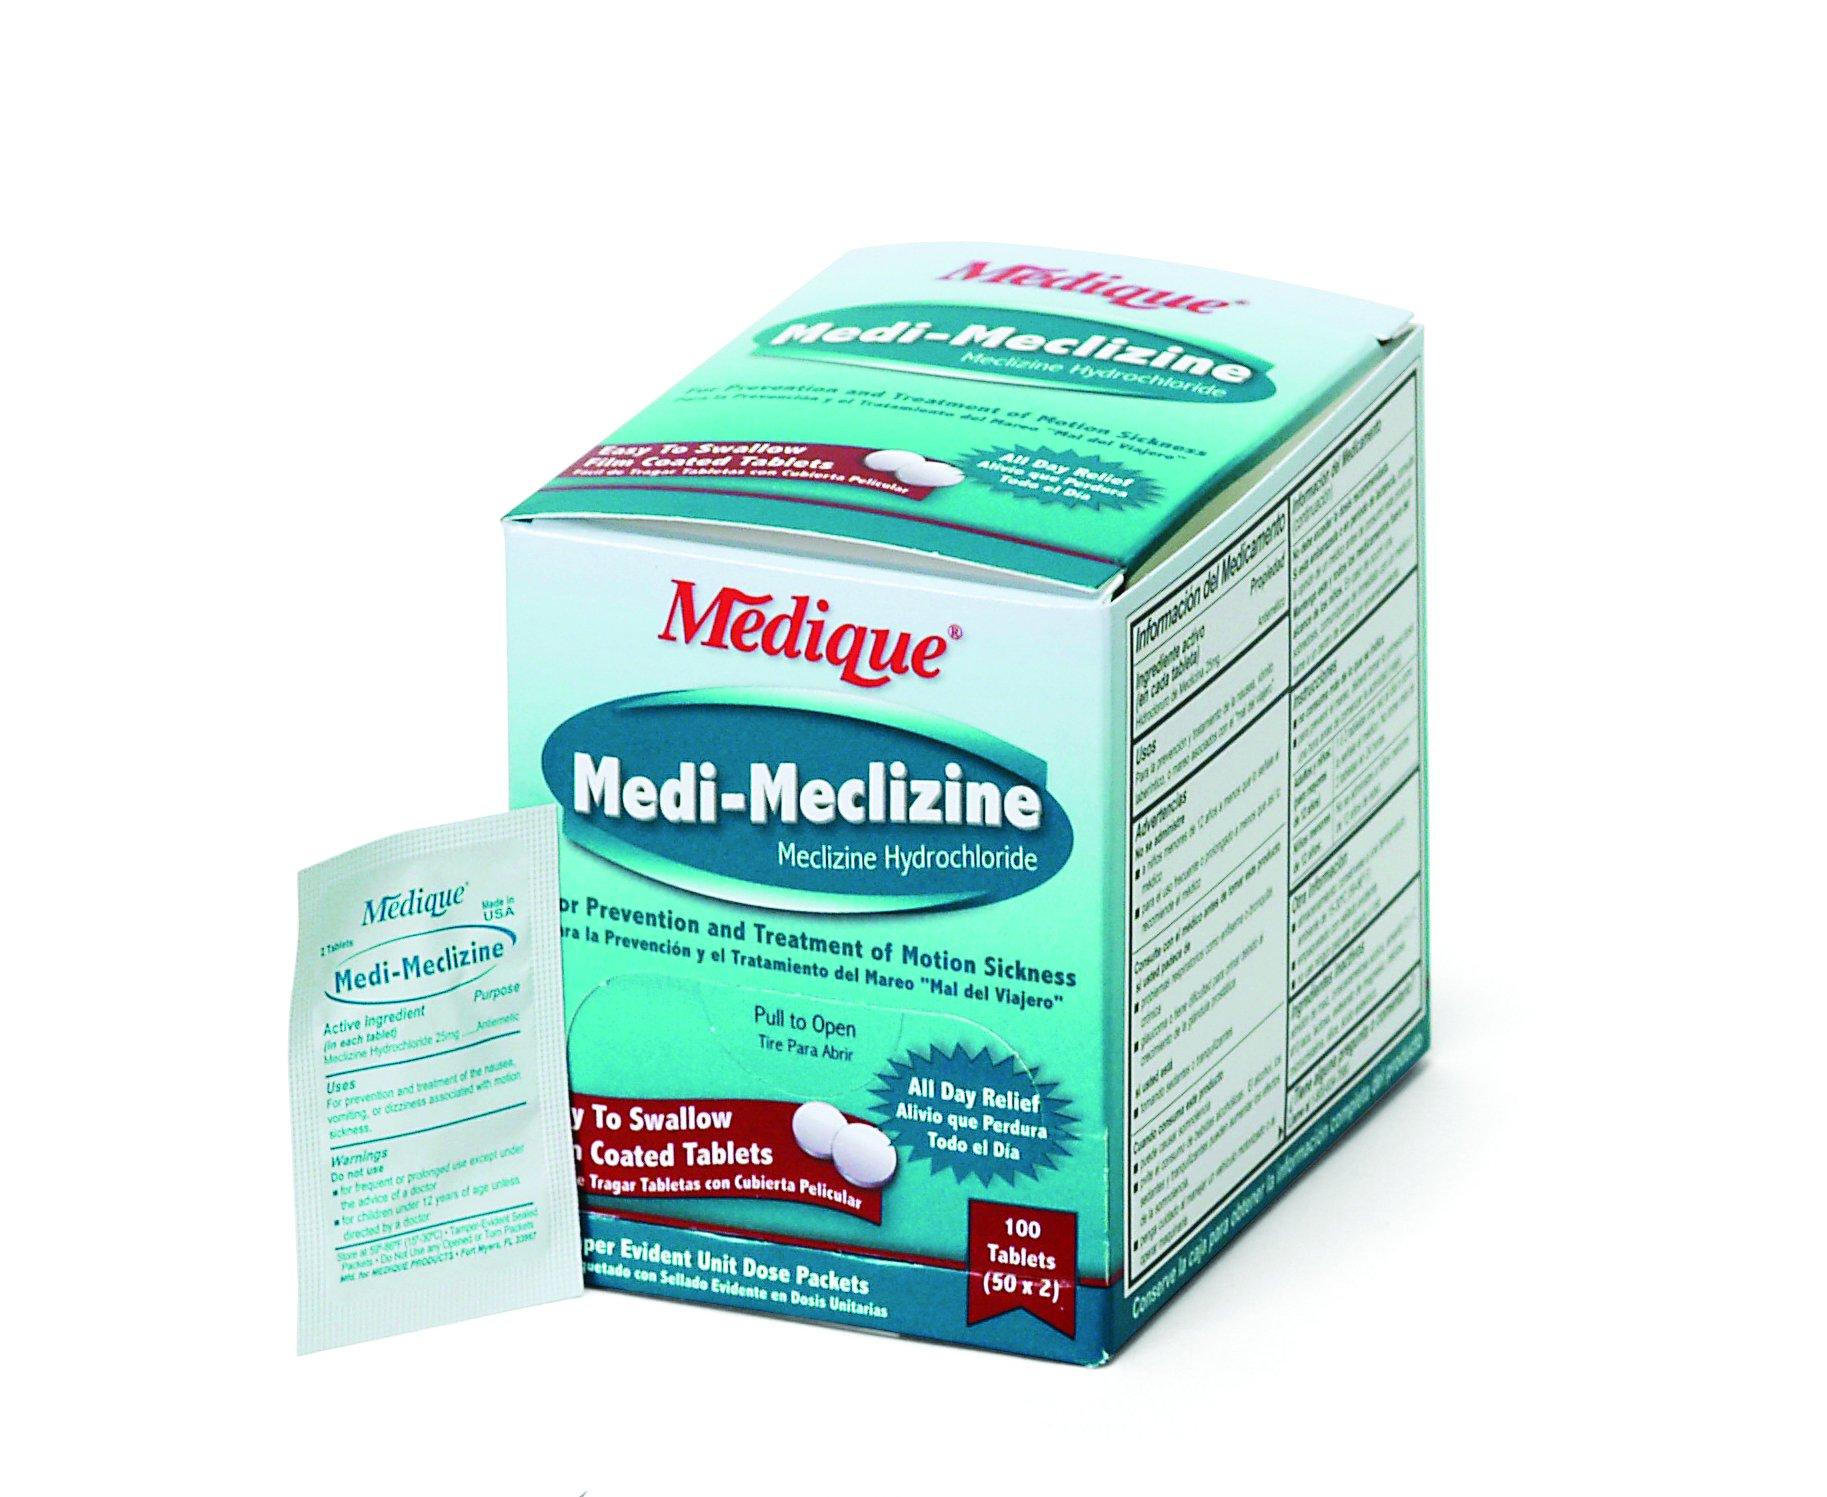 Medique 47933 Medi-Meclizine, 100 Tablets product image